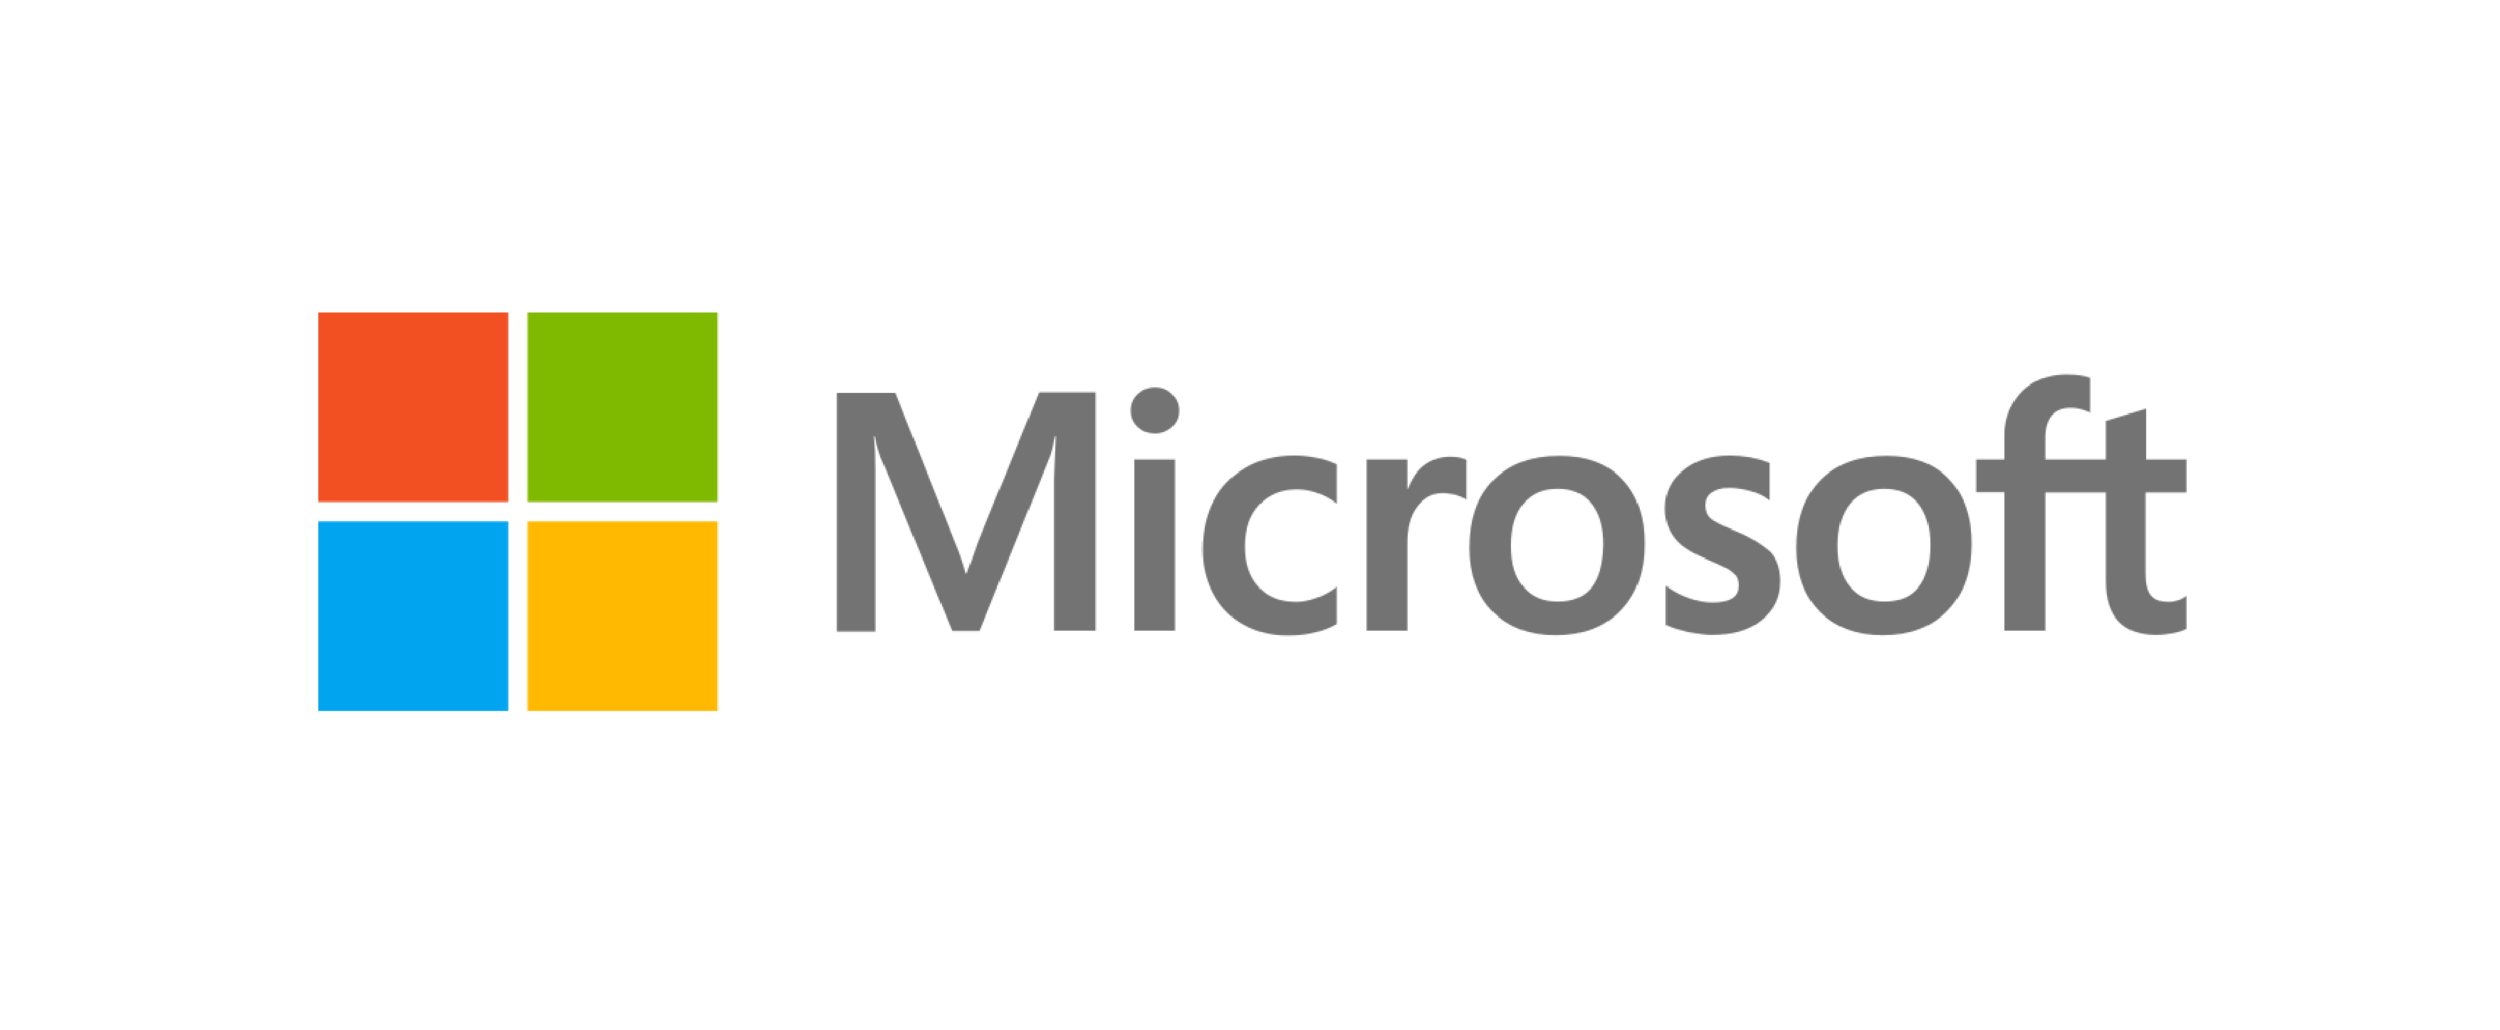 Partners_Logo_Microsoft-01.png